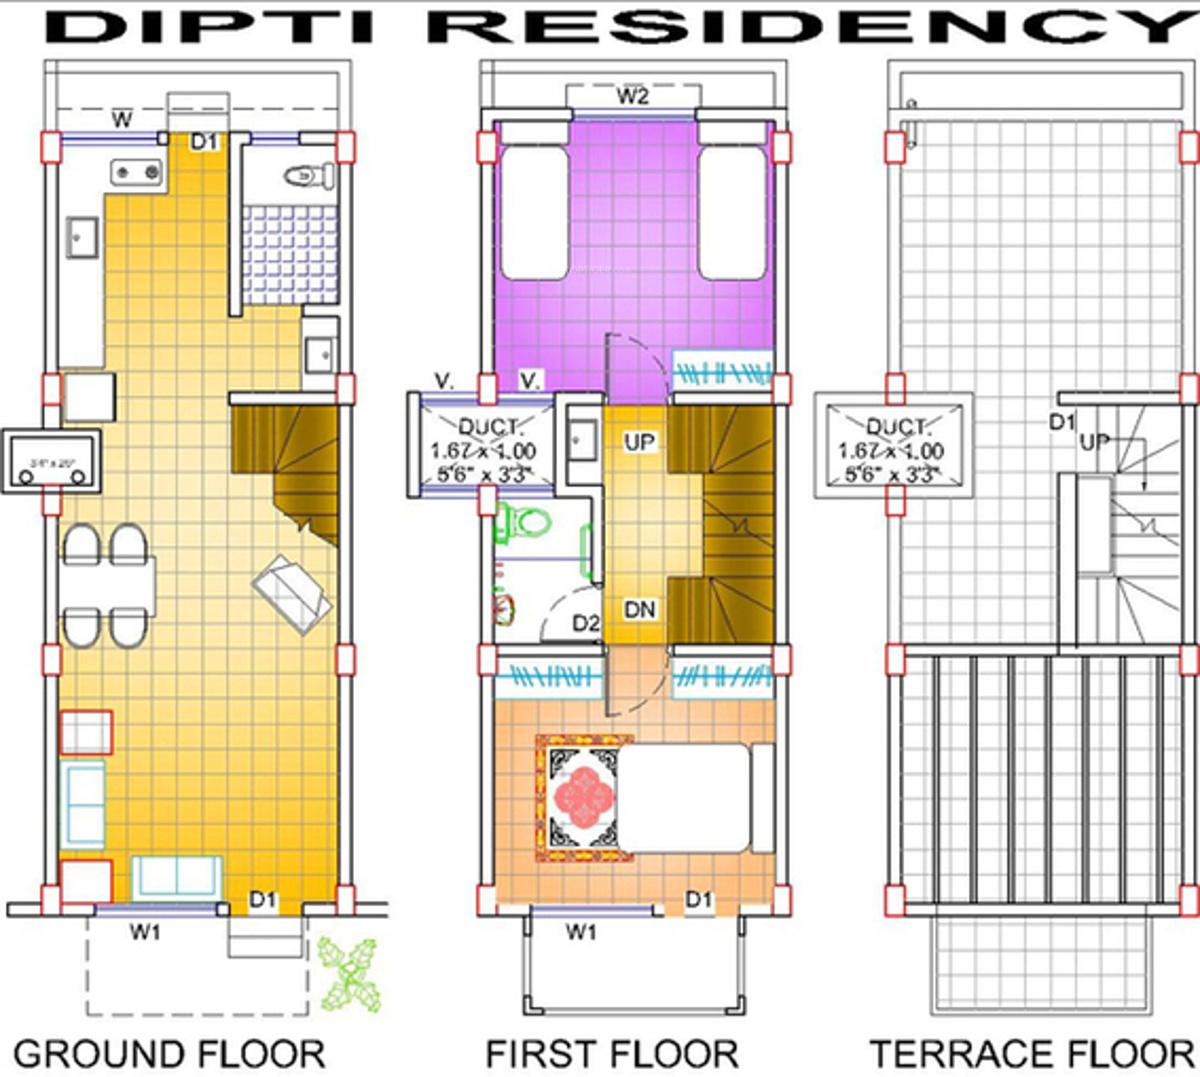 Dipti residency in morewadi kolhapur price location for Floor plan creator for windows 7